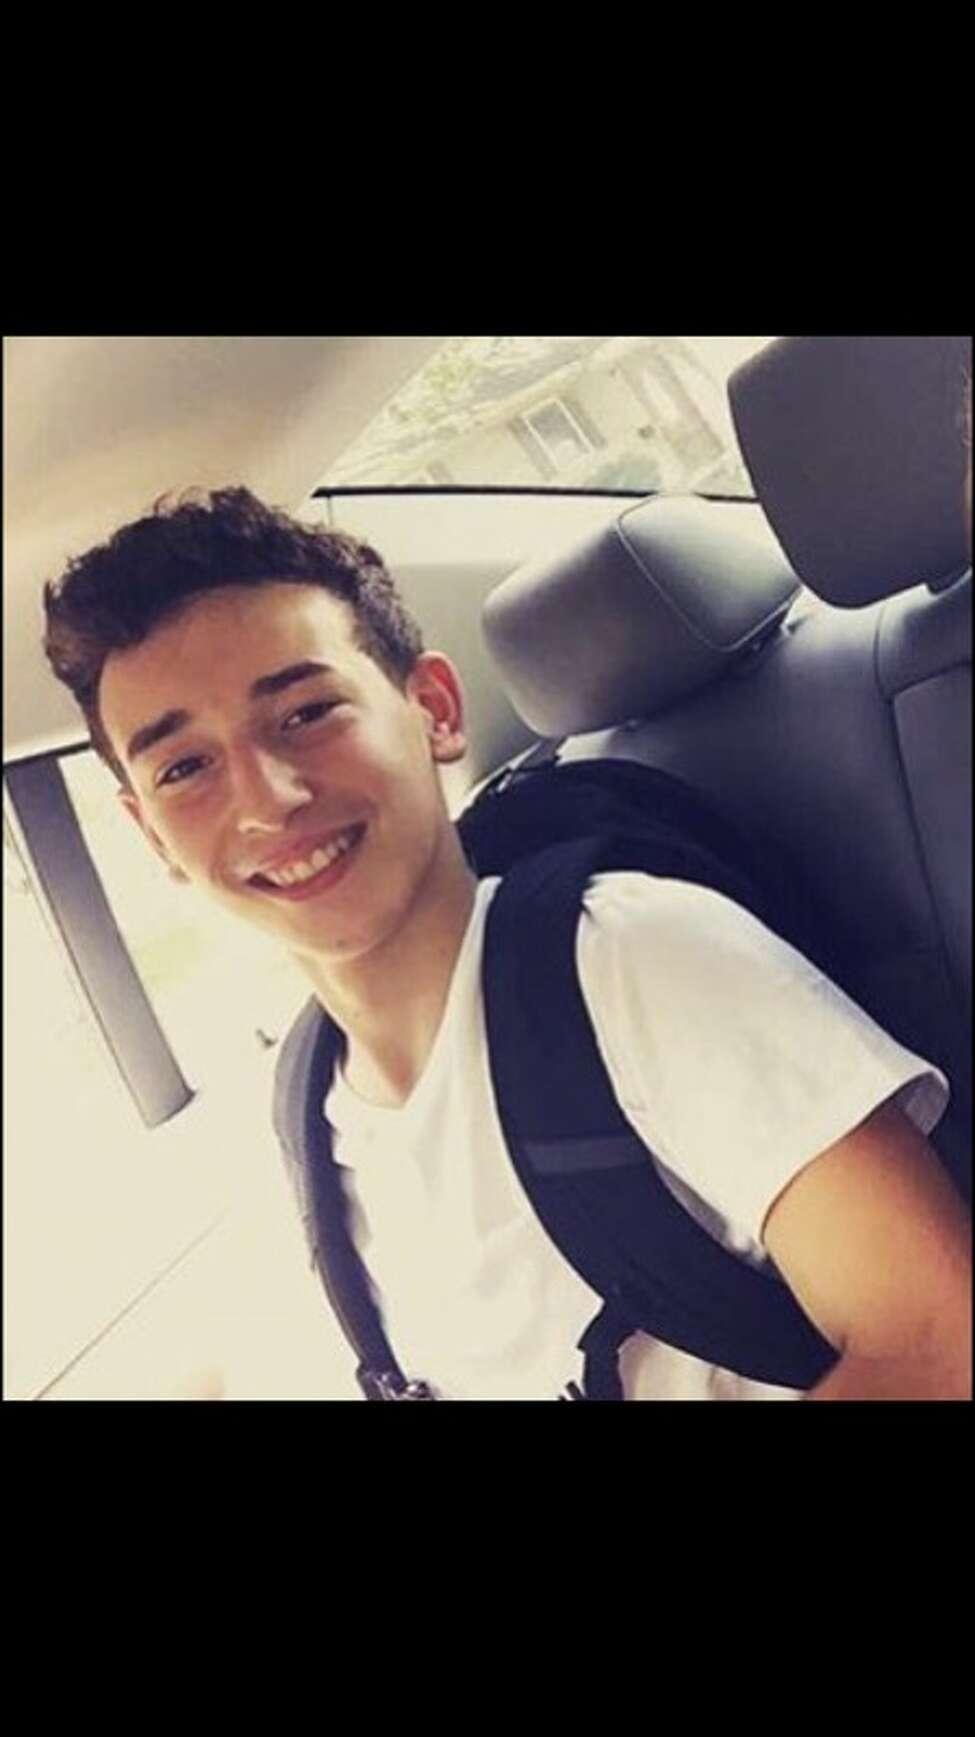 Niko Dinovo, 16, who was critically burned in a crash Friday, Oct. 28, 2016.